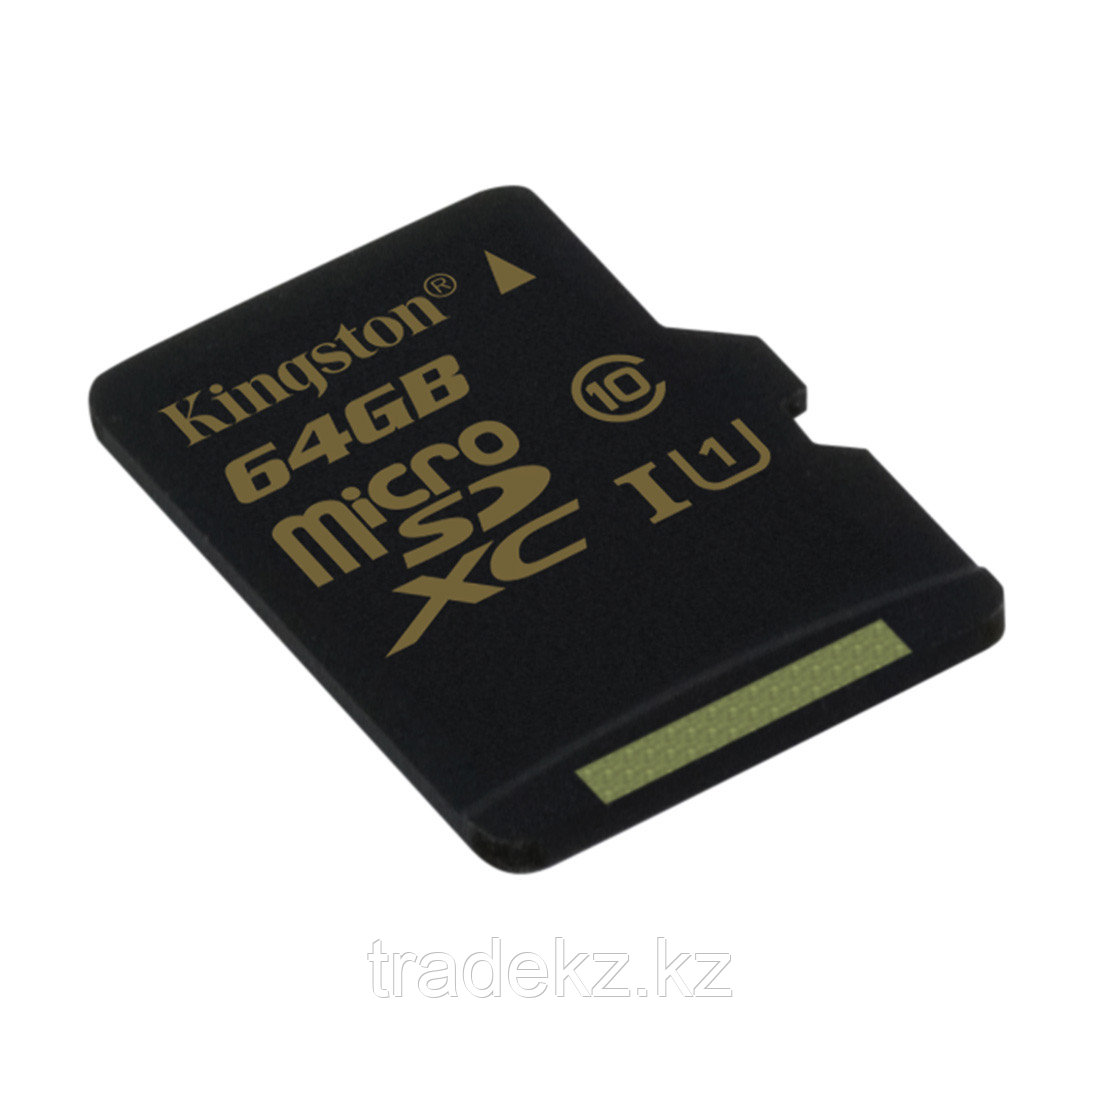 Карта памяти Kingston SDC10G2/64GBSP Class 10  64GB